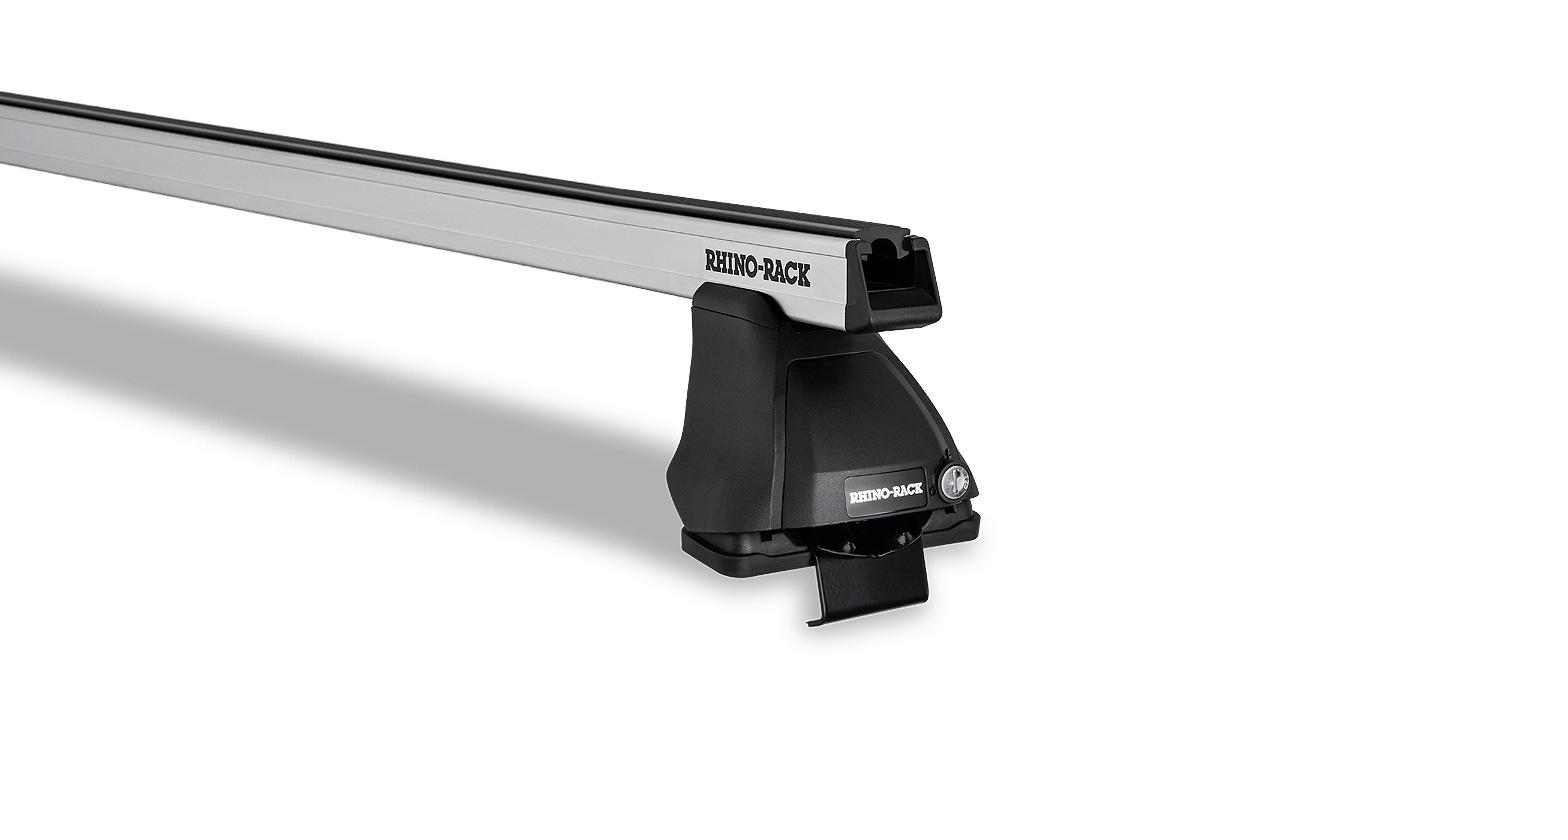 Rhino Rack Heavy Duty 2500 Silver 1 Bar Roof Rack